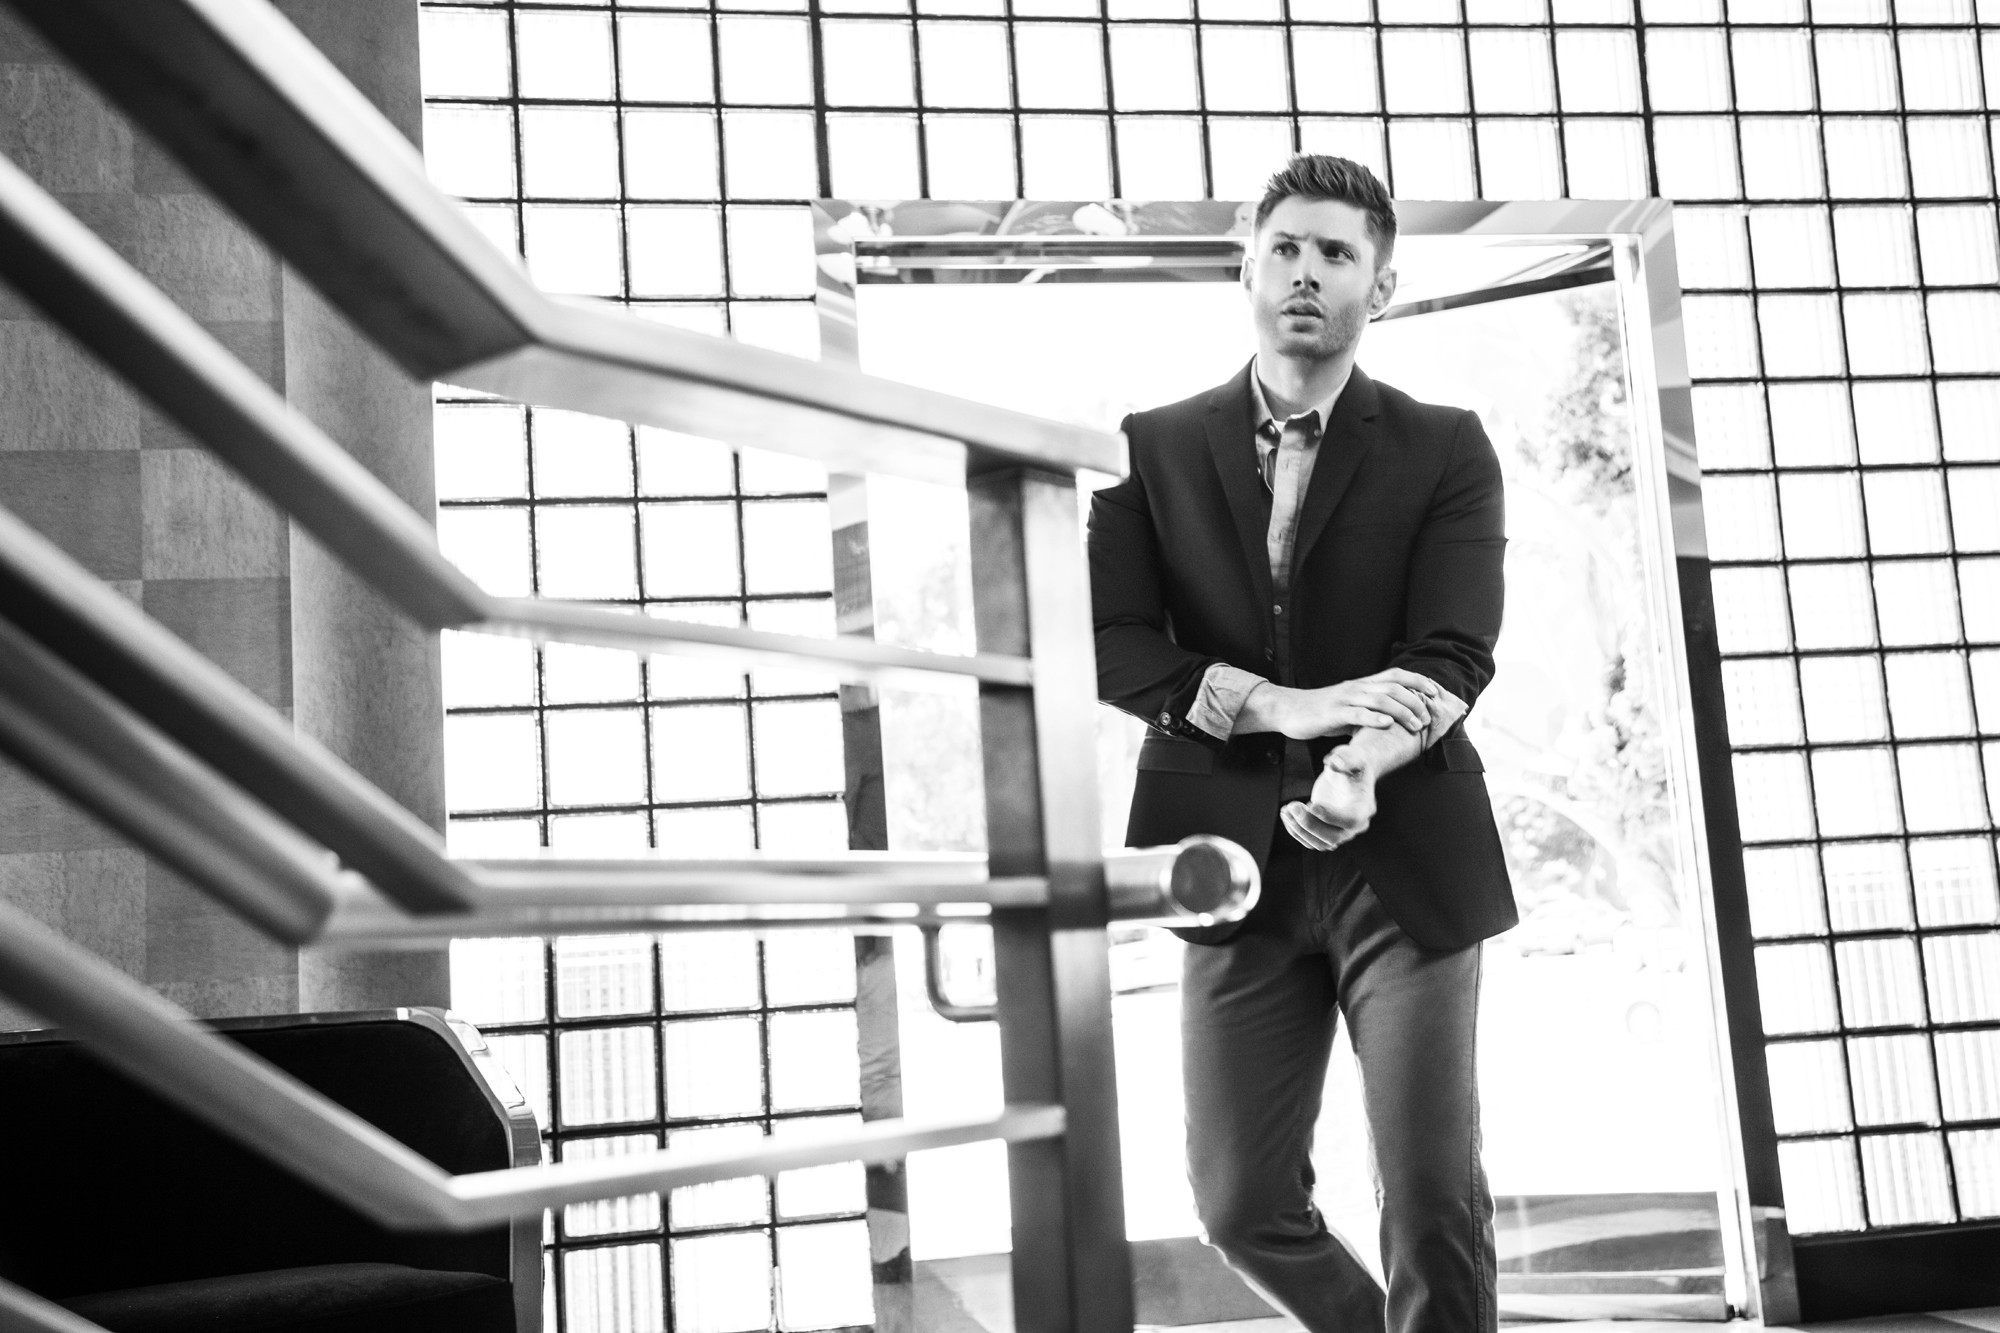 ДЖЕНСЕН ЭКЛЗ - Страница 6 Celeber-ru-Jensen-Ackles-Harper-s-Bazaar-CH-Magazine-Photoshoot-2014-05